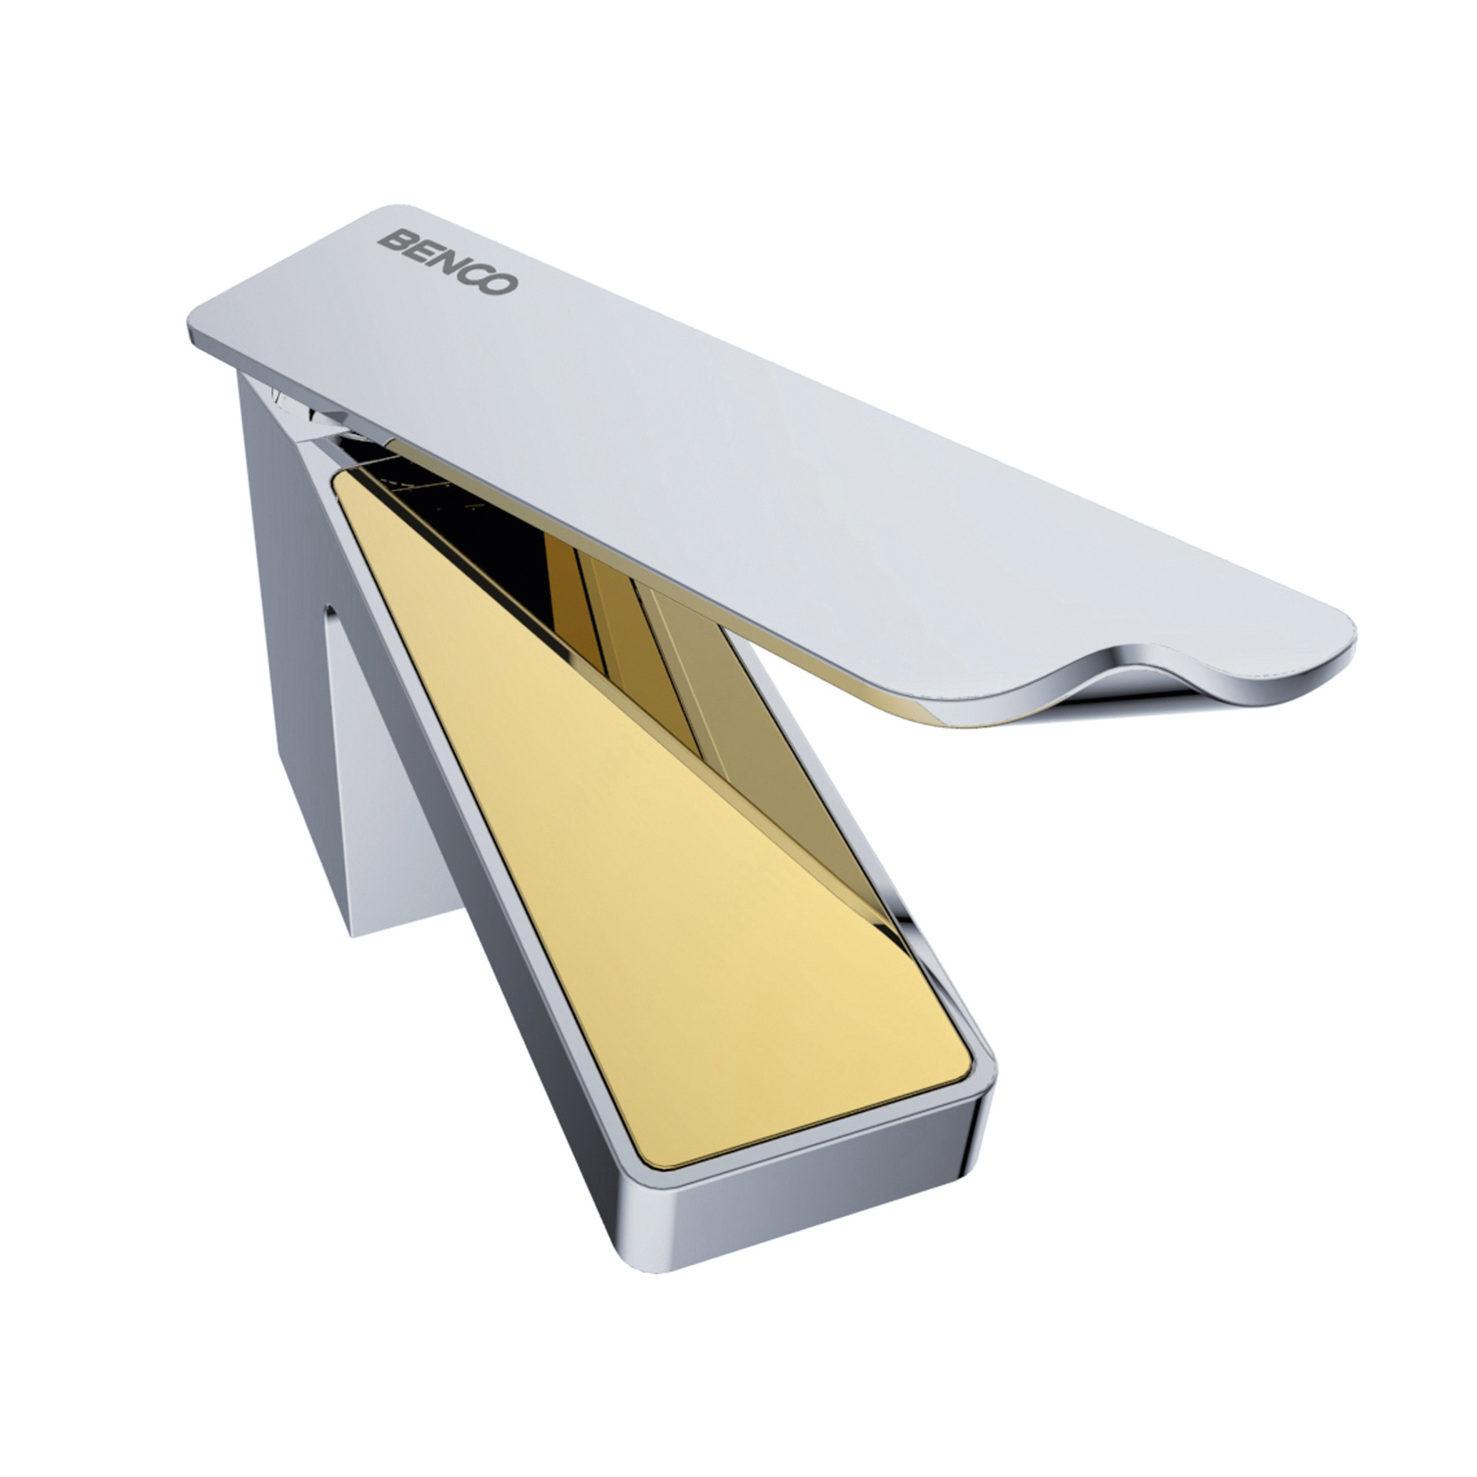 Armatura umywalkowa Find nagrodzona Red Dot Design Award. www.benco.com.en